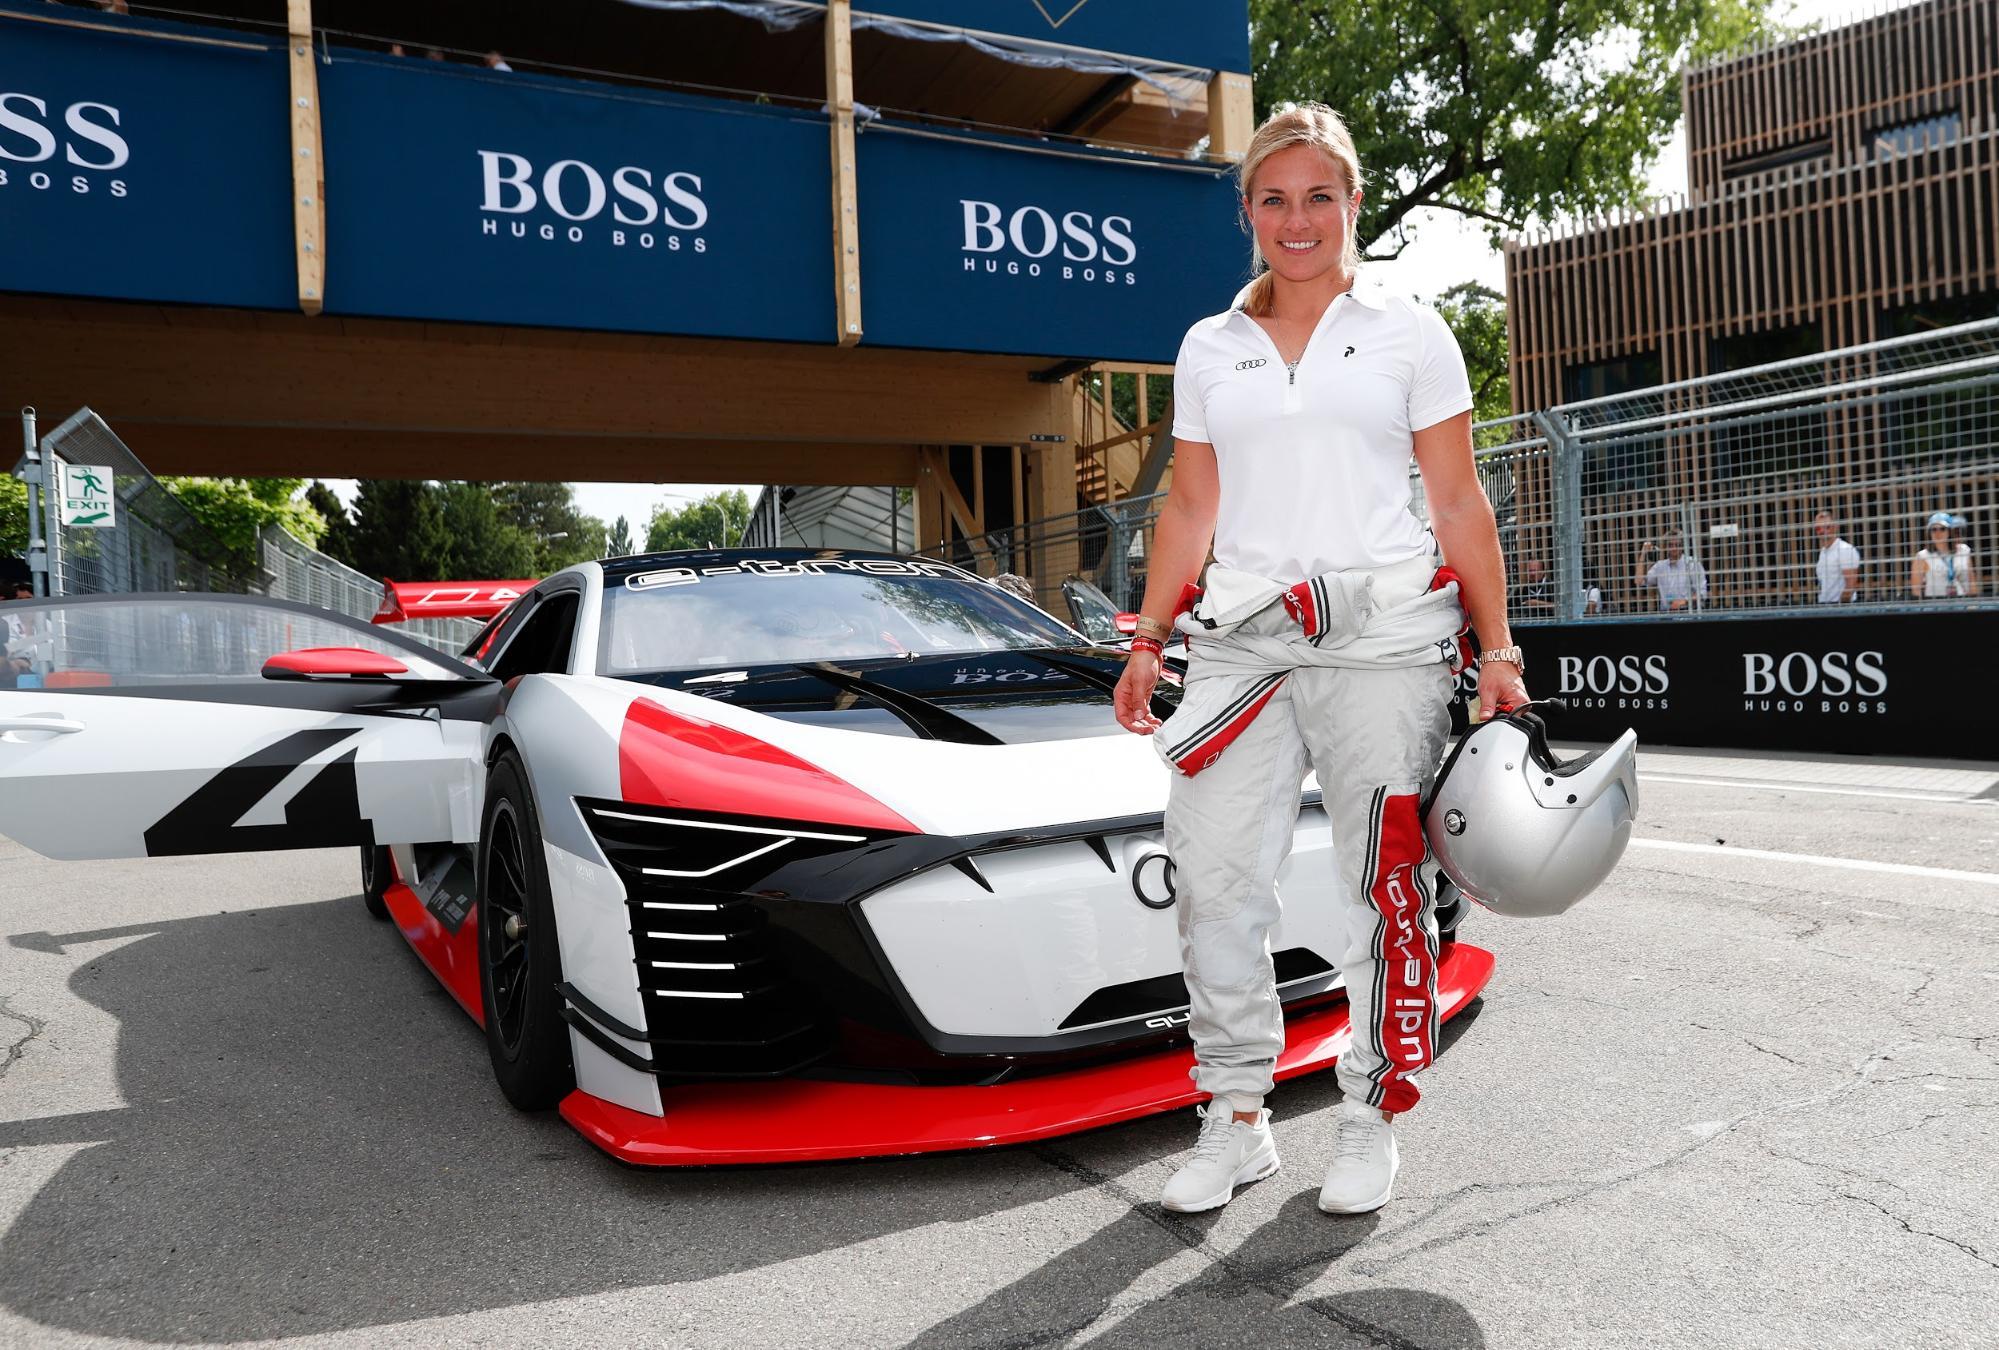 Lara Gut-Behrami devant l'Audi e-tronVisionGranTurismo lors de l'E-Prix2018 de Zurich. (Sven Thomann)